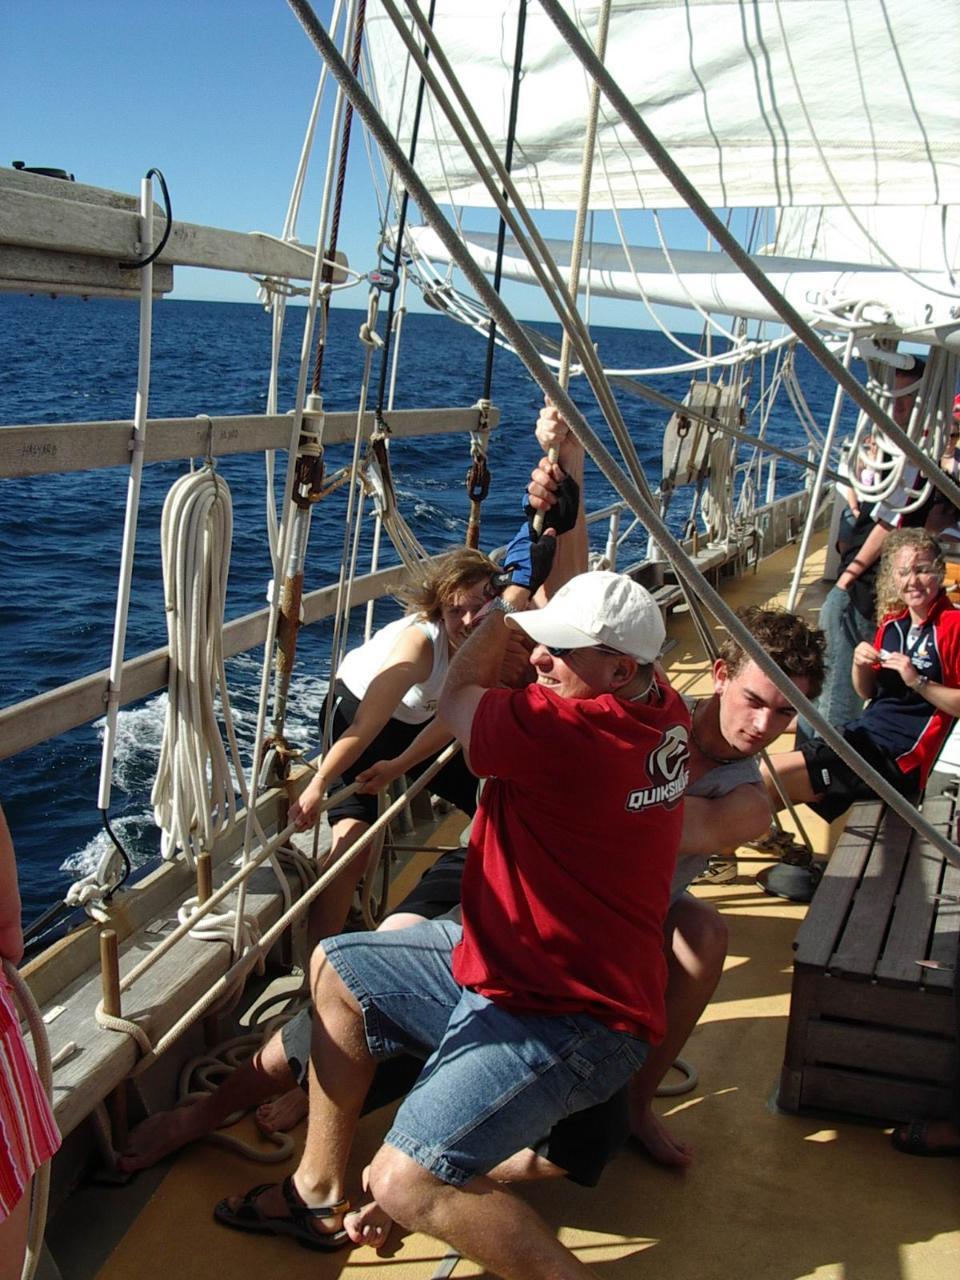 4-day General Public Voyages